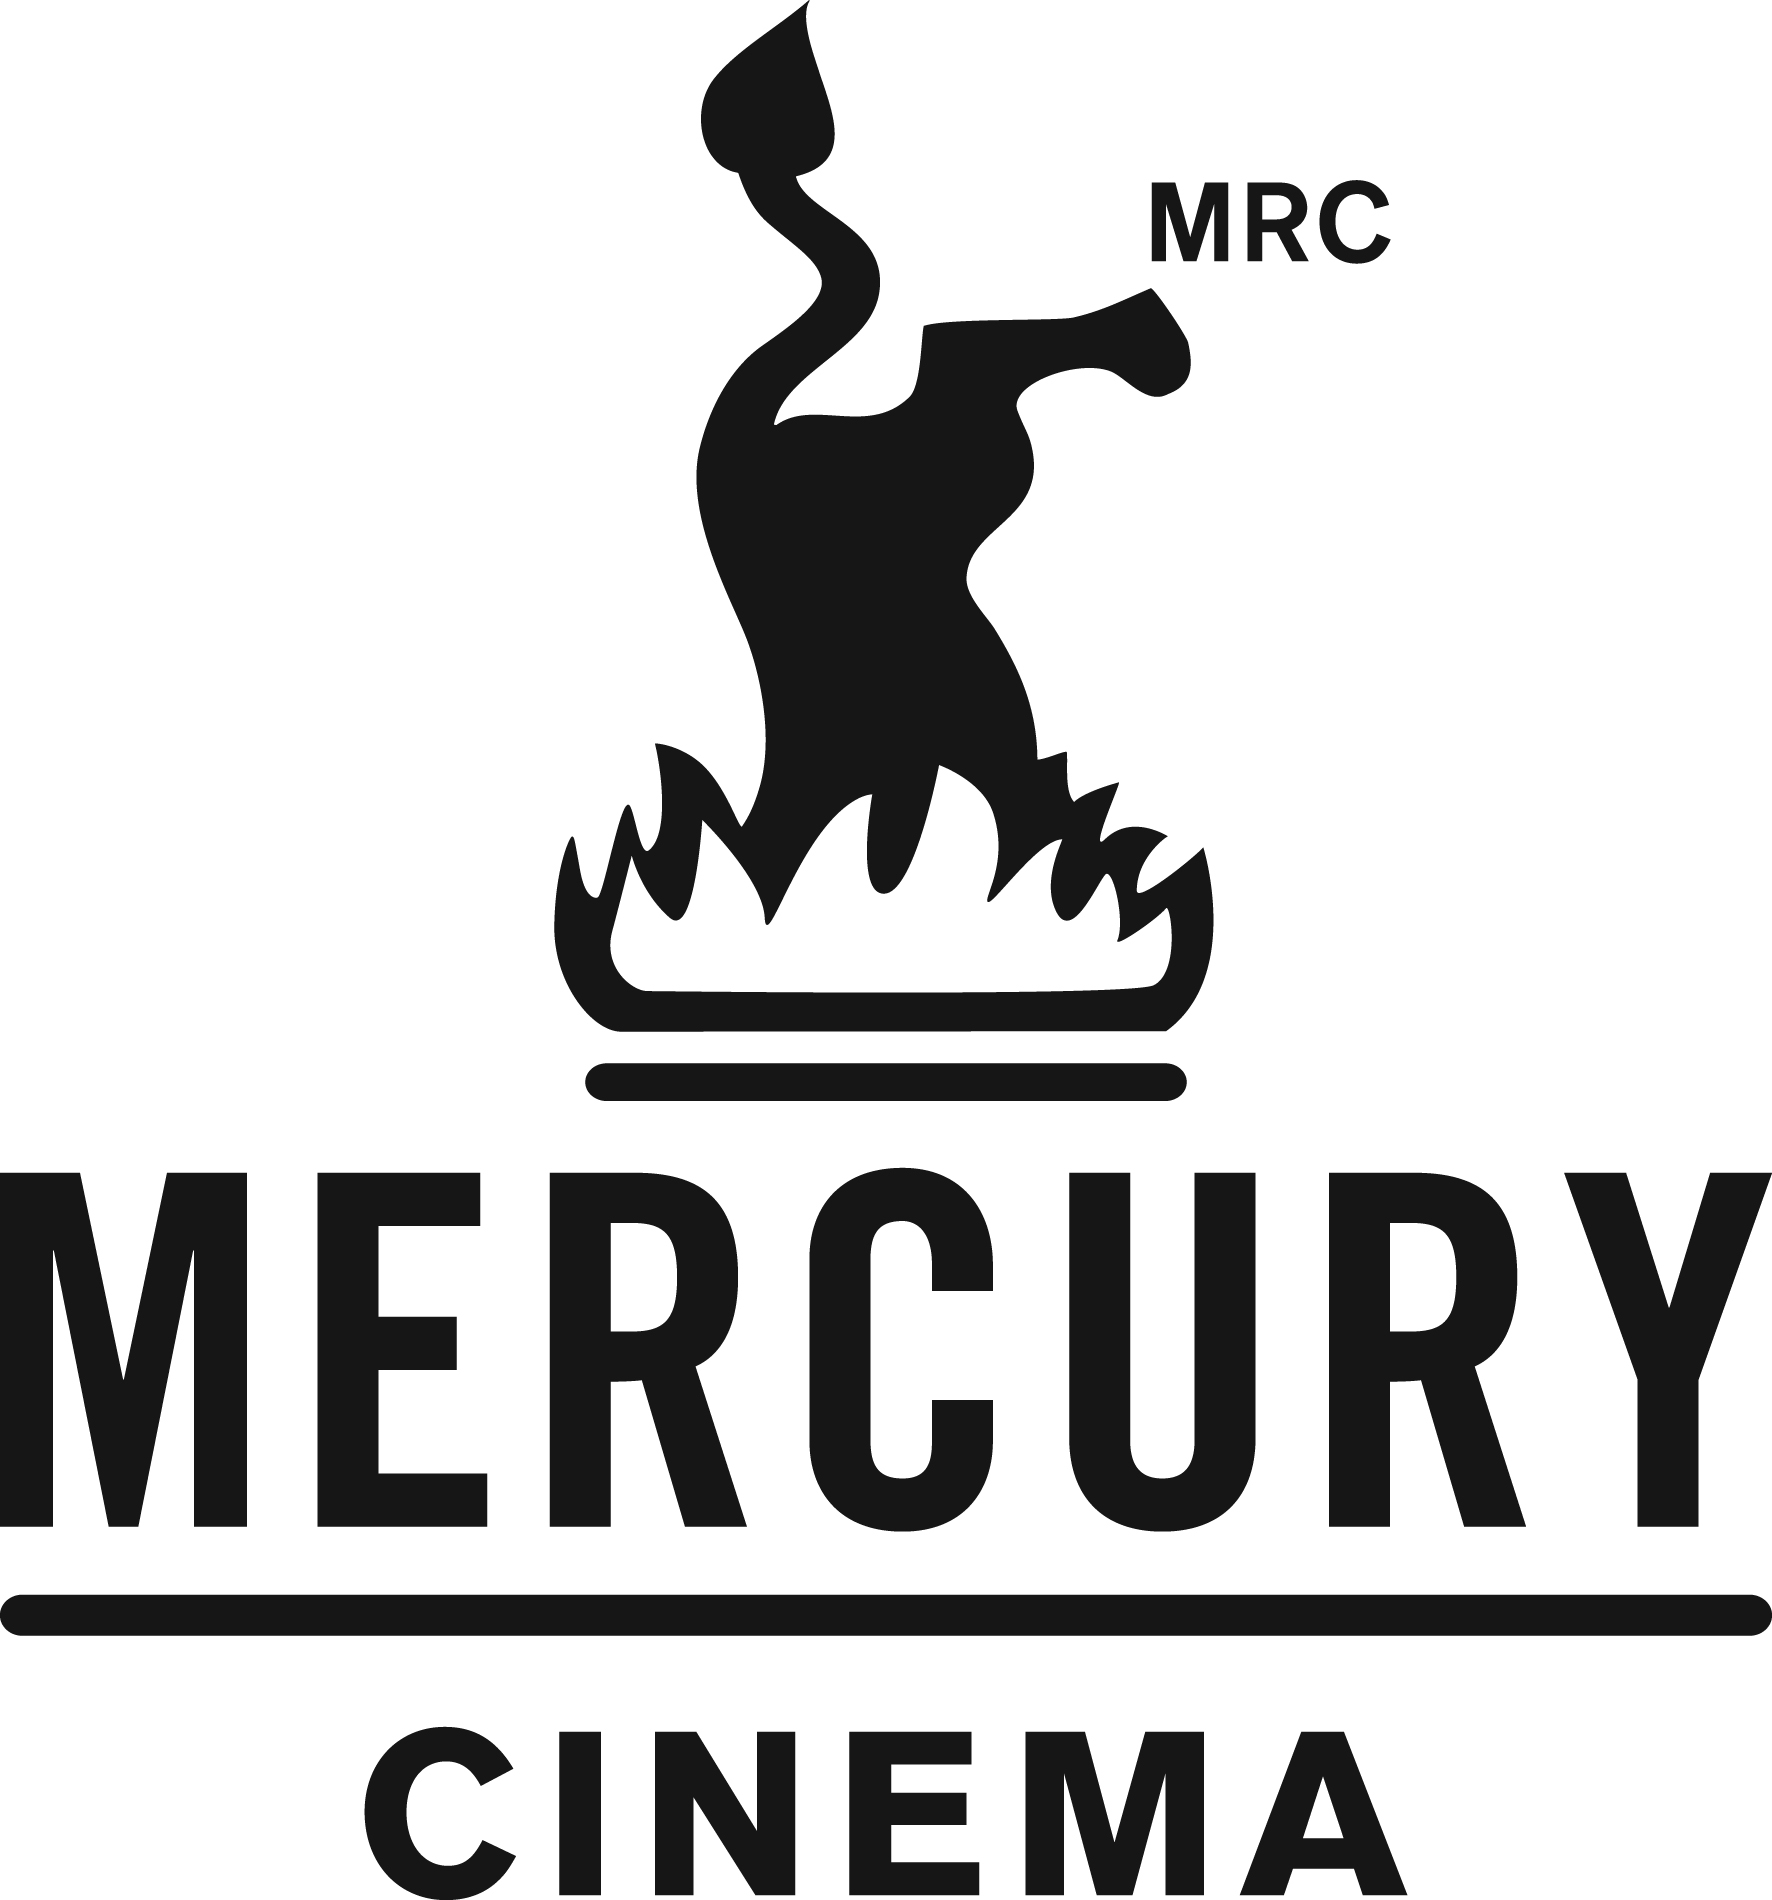 Mercury_LG_K